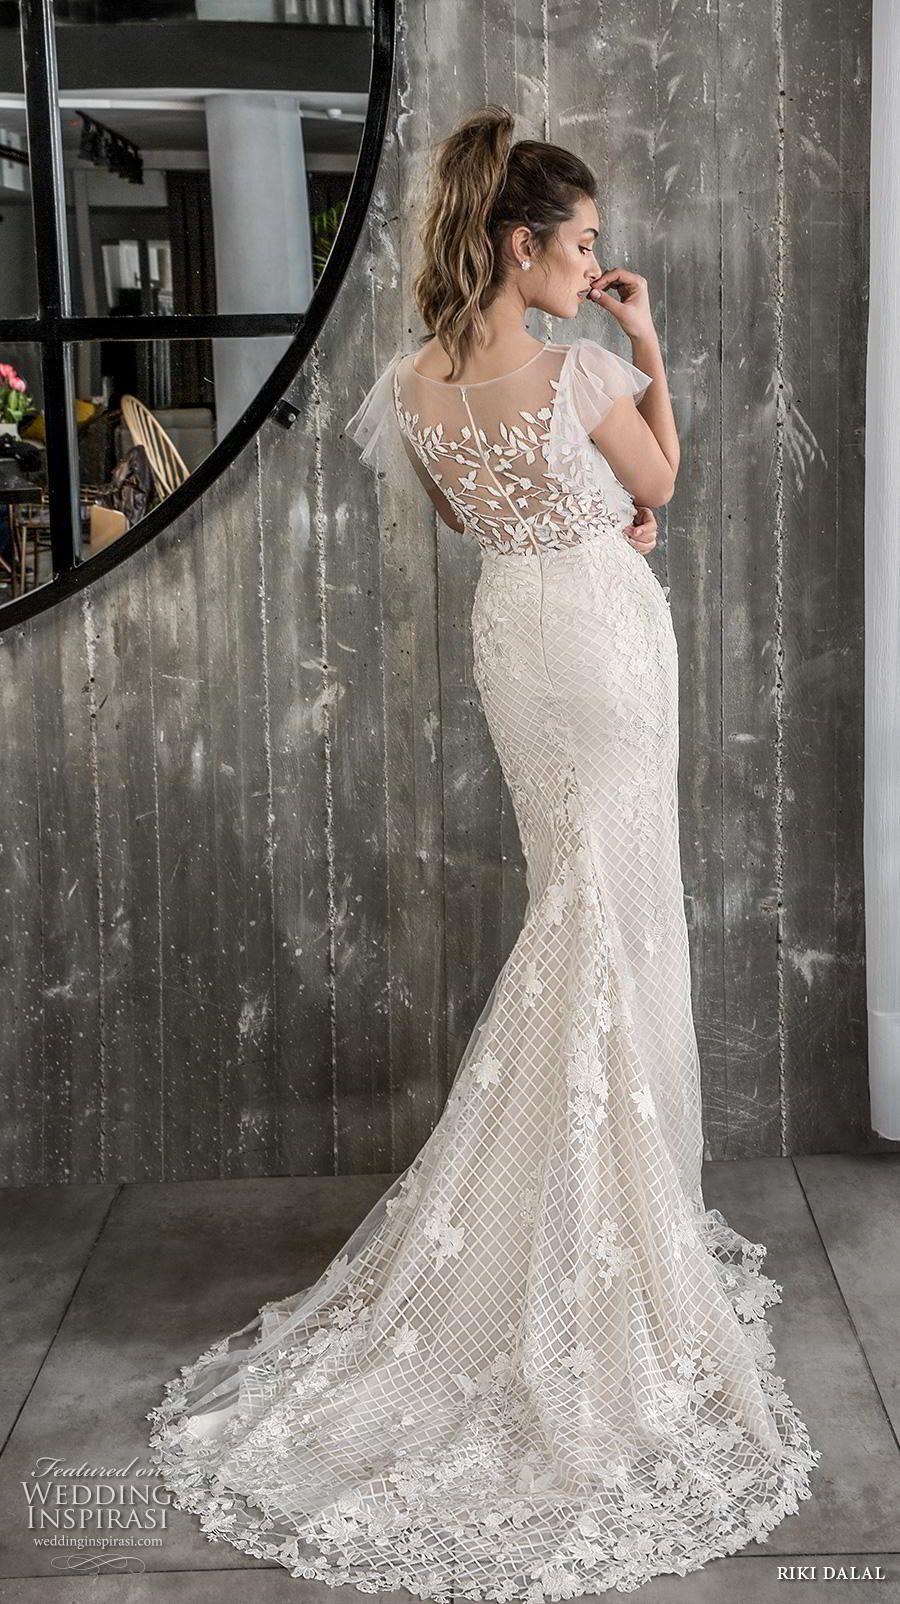 e5575e982c riki dalal 2018 glamour bridal cap sleeves illusion bateau neck full  embellishment romantic fit and flare wedding dress sheer lace back short  train (3) bv ...